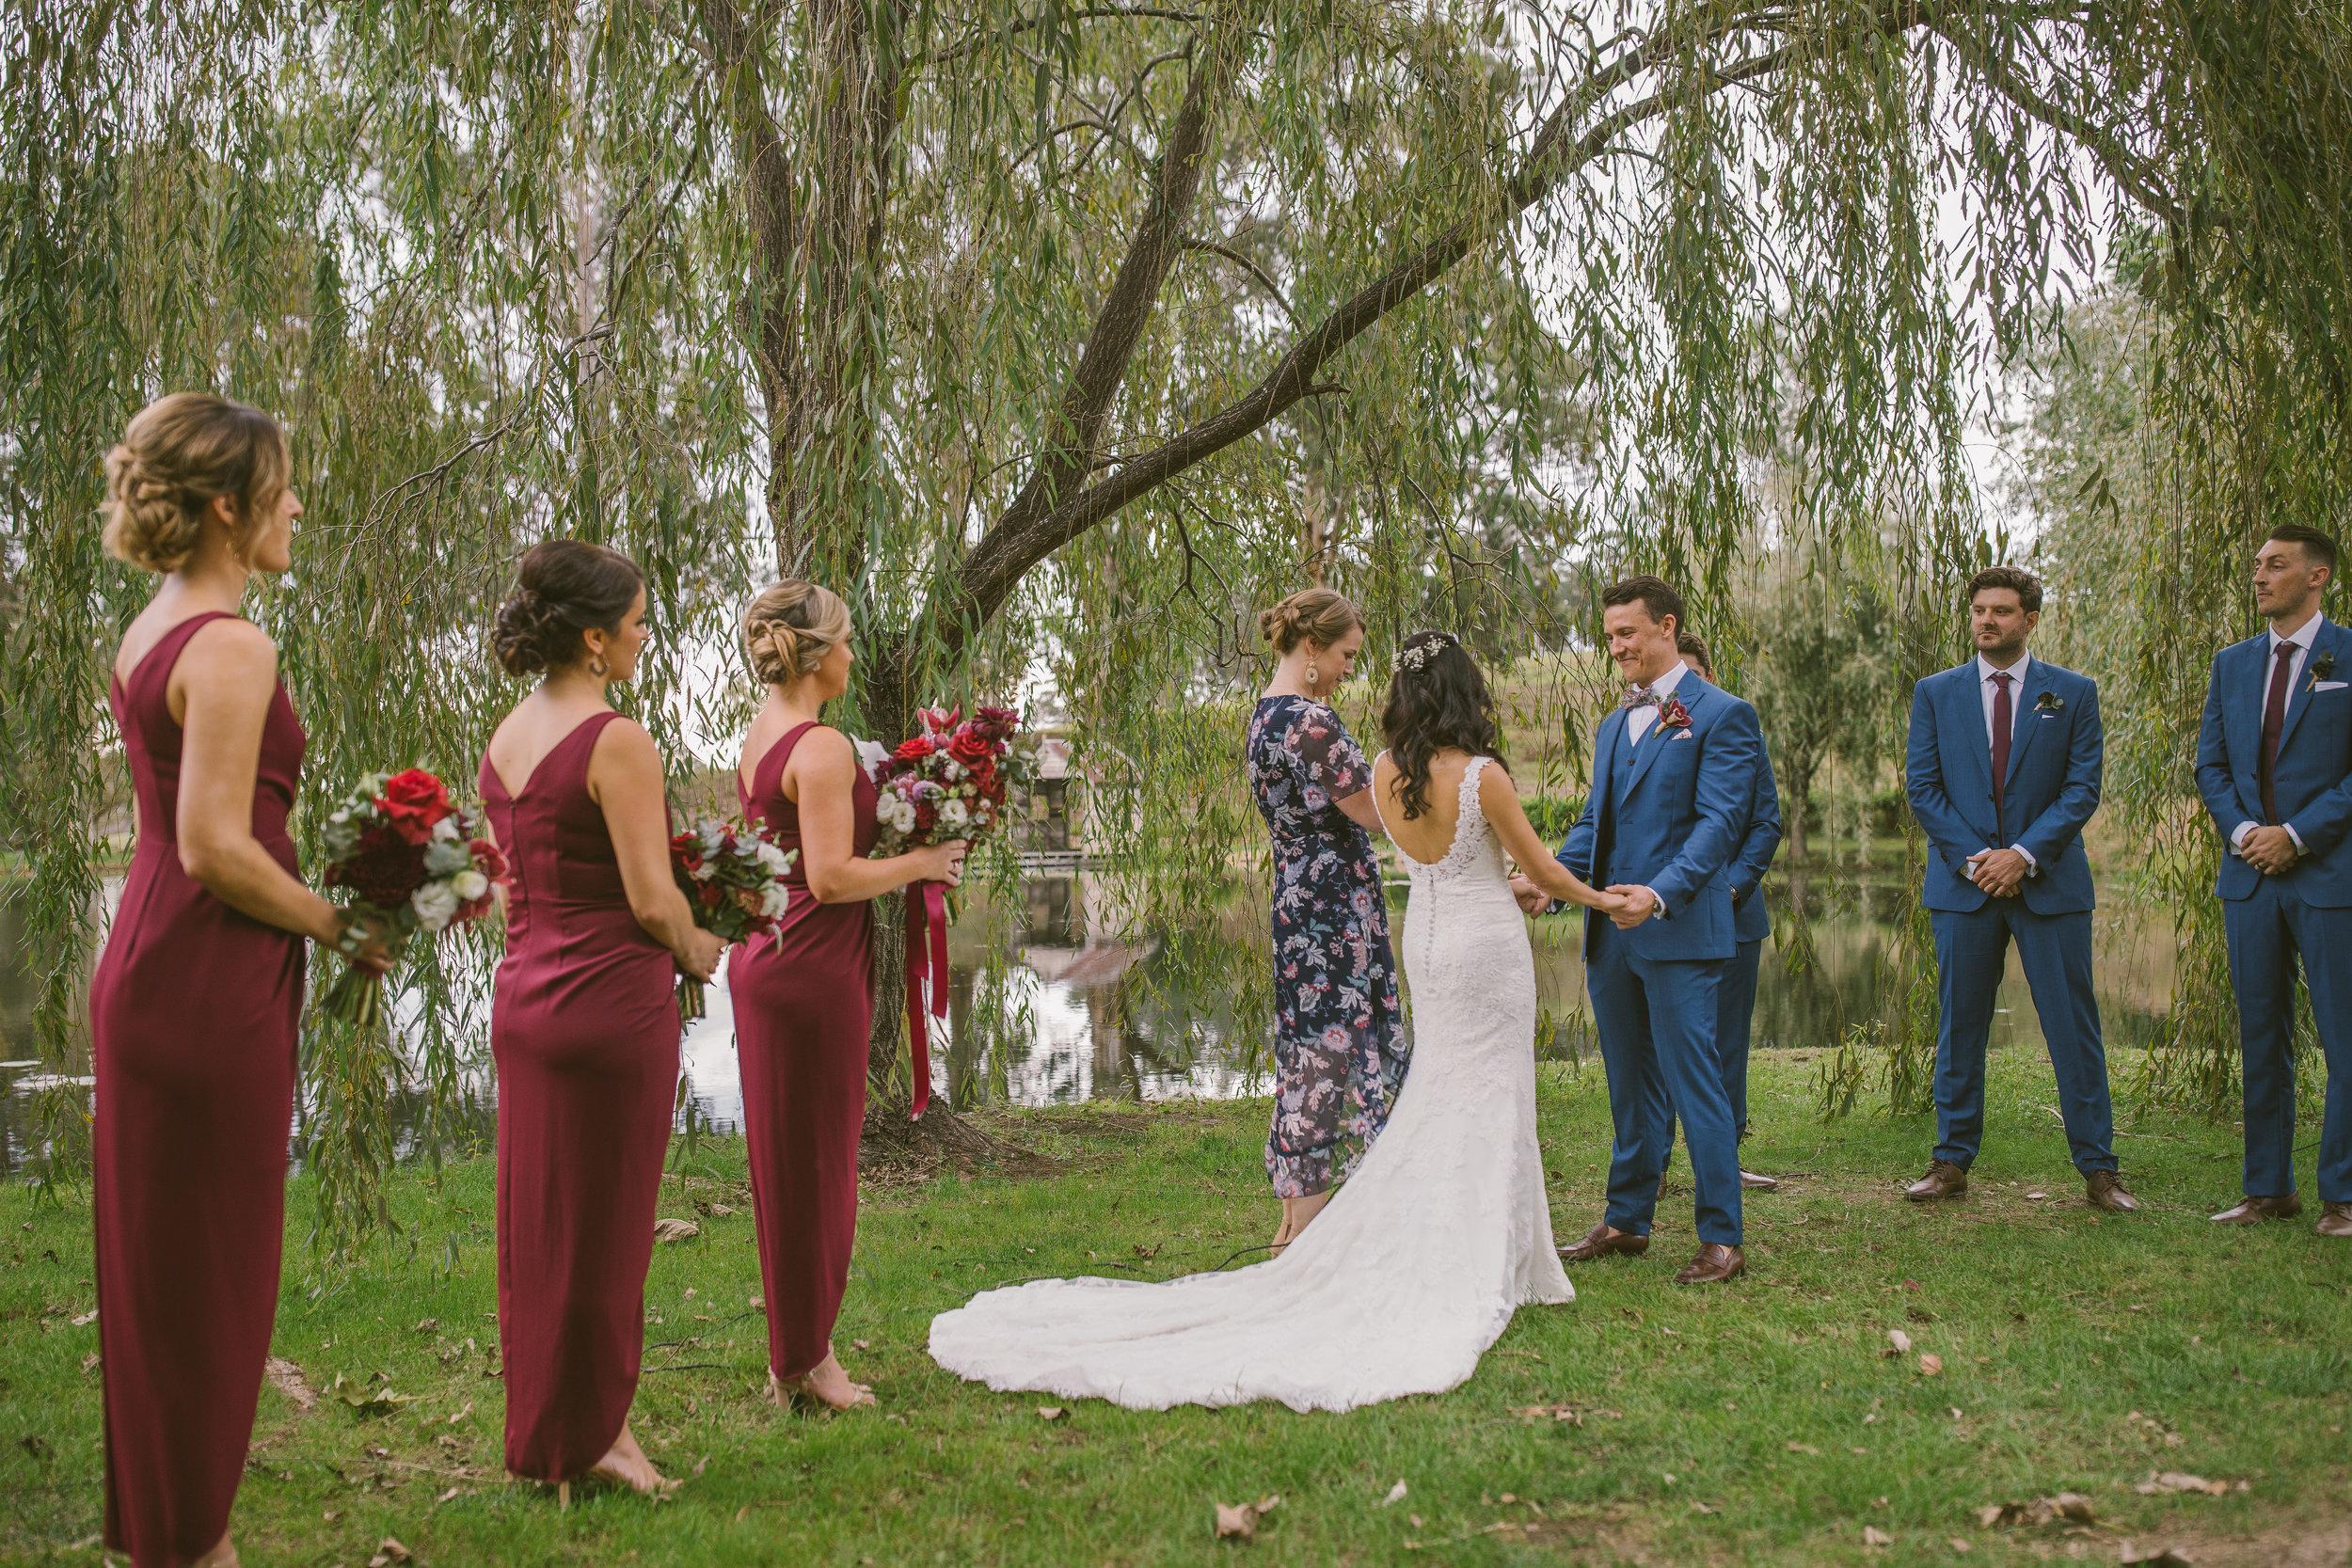 Sarah + Jason - Mali Brae Farm Wedding Photographer - Magnus Agren Photography-0294.jpg